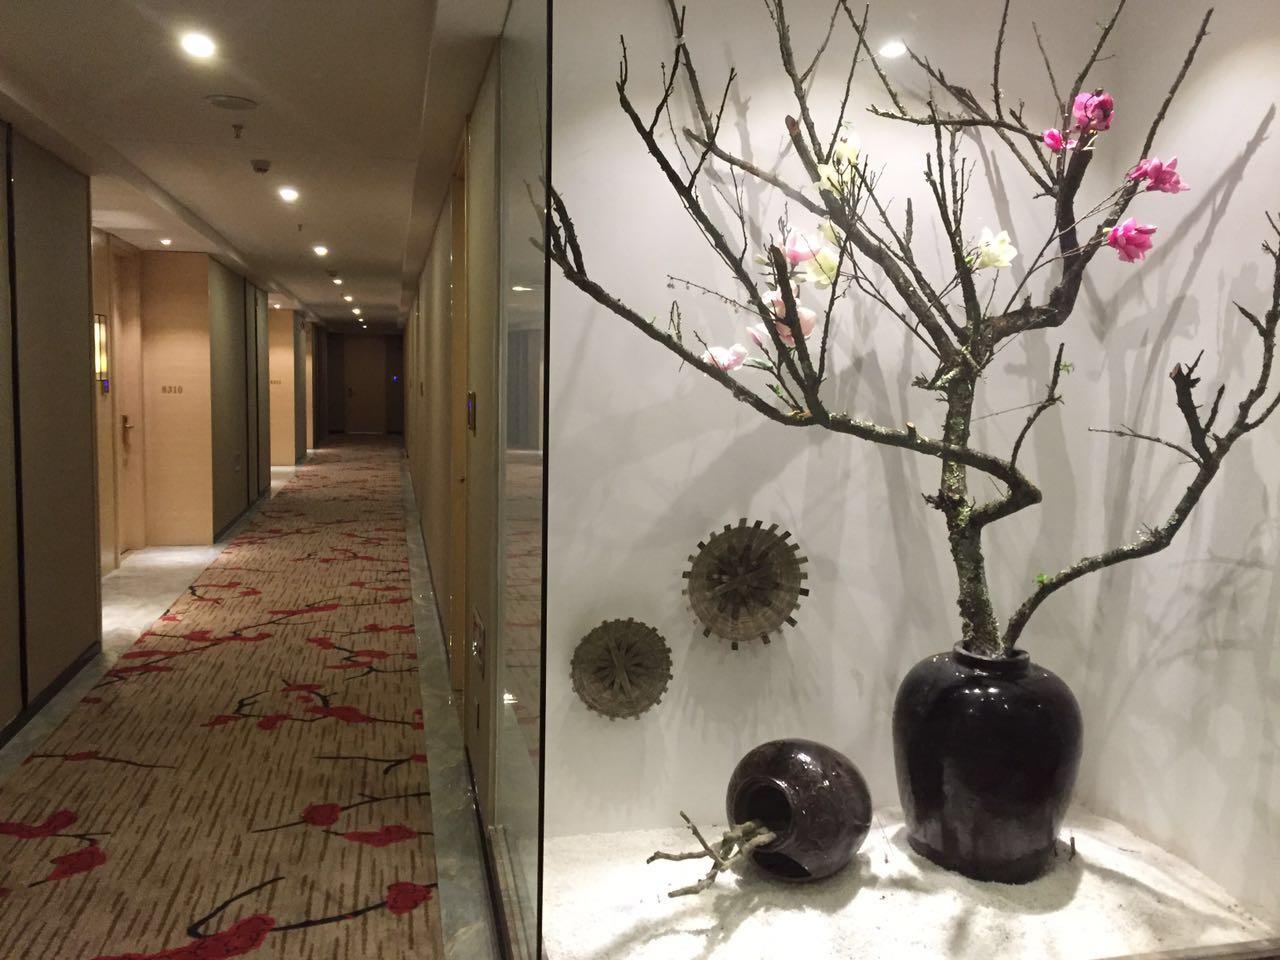 客(ke)商(shang)匯(hui)酒店